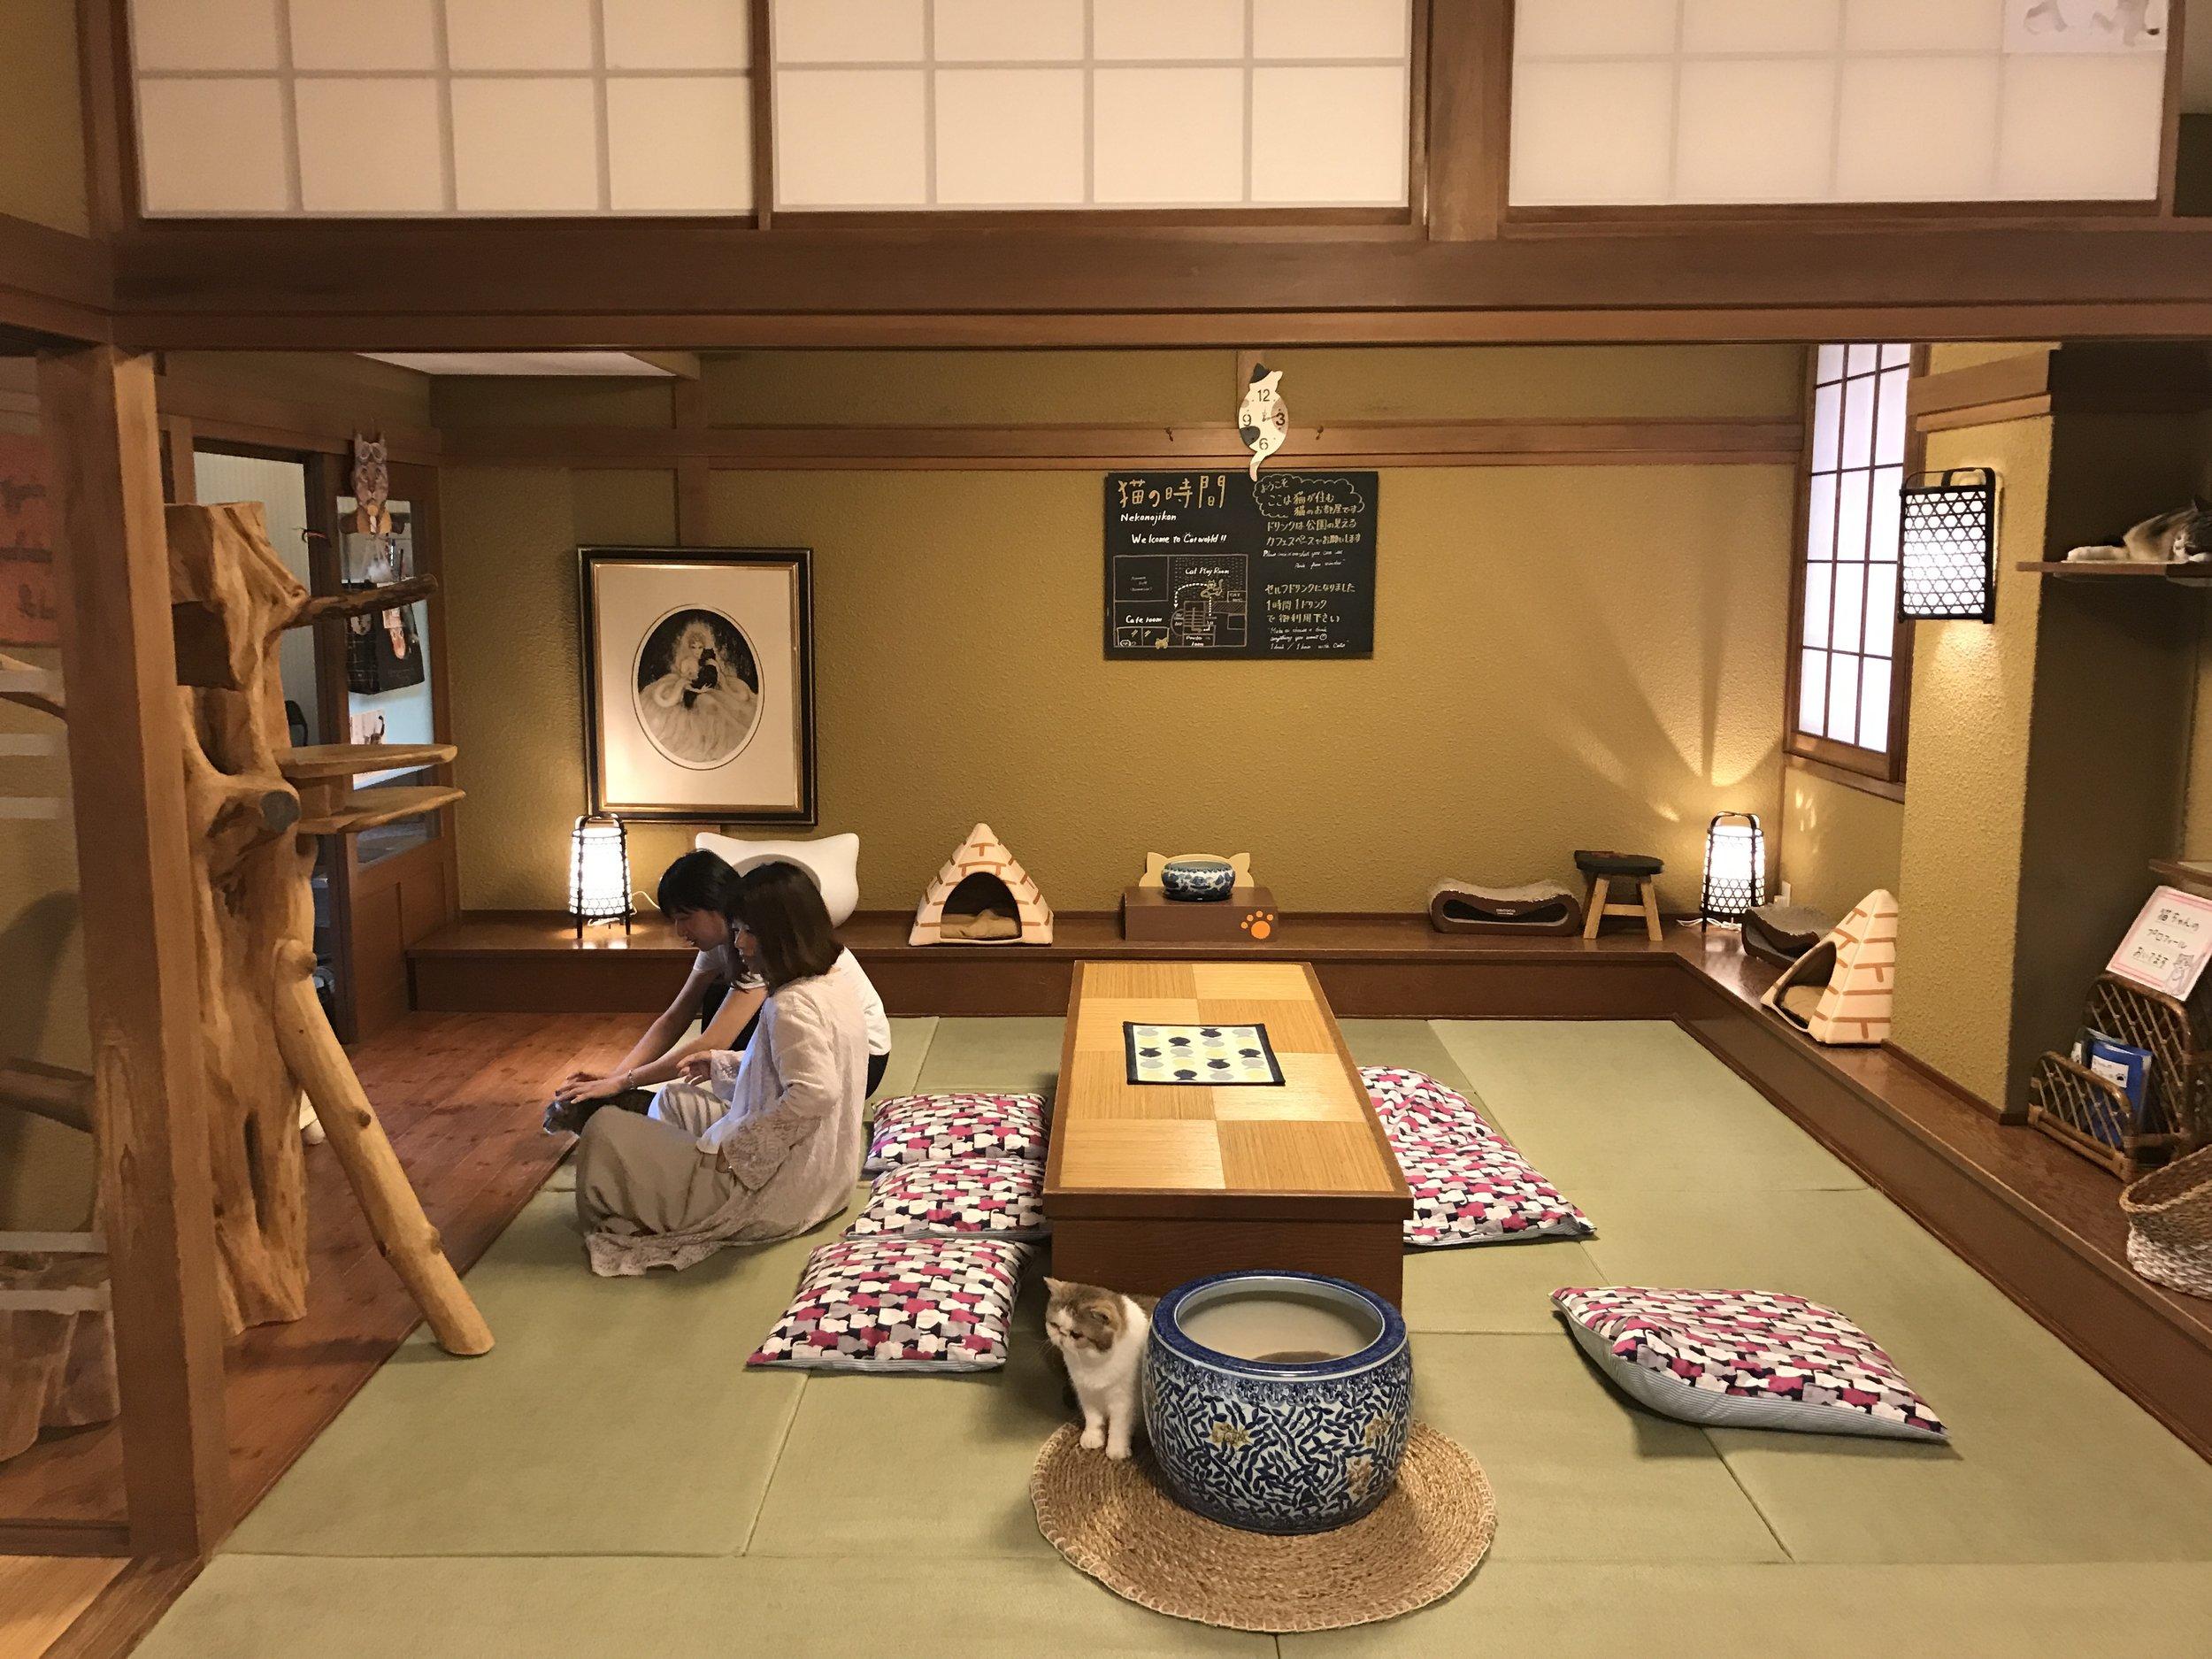 The decor at Neko no Jikan is traditional Japanese, with tatami mats and shoji screens